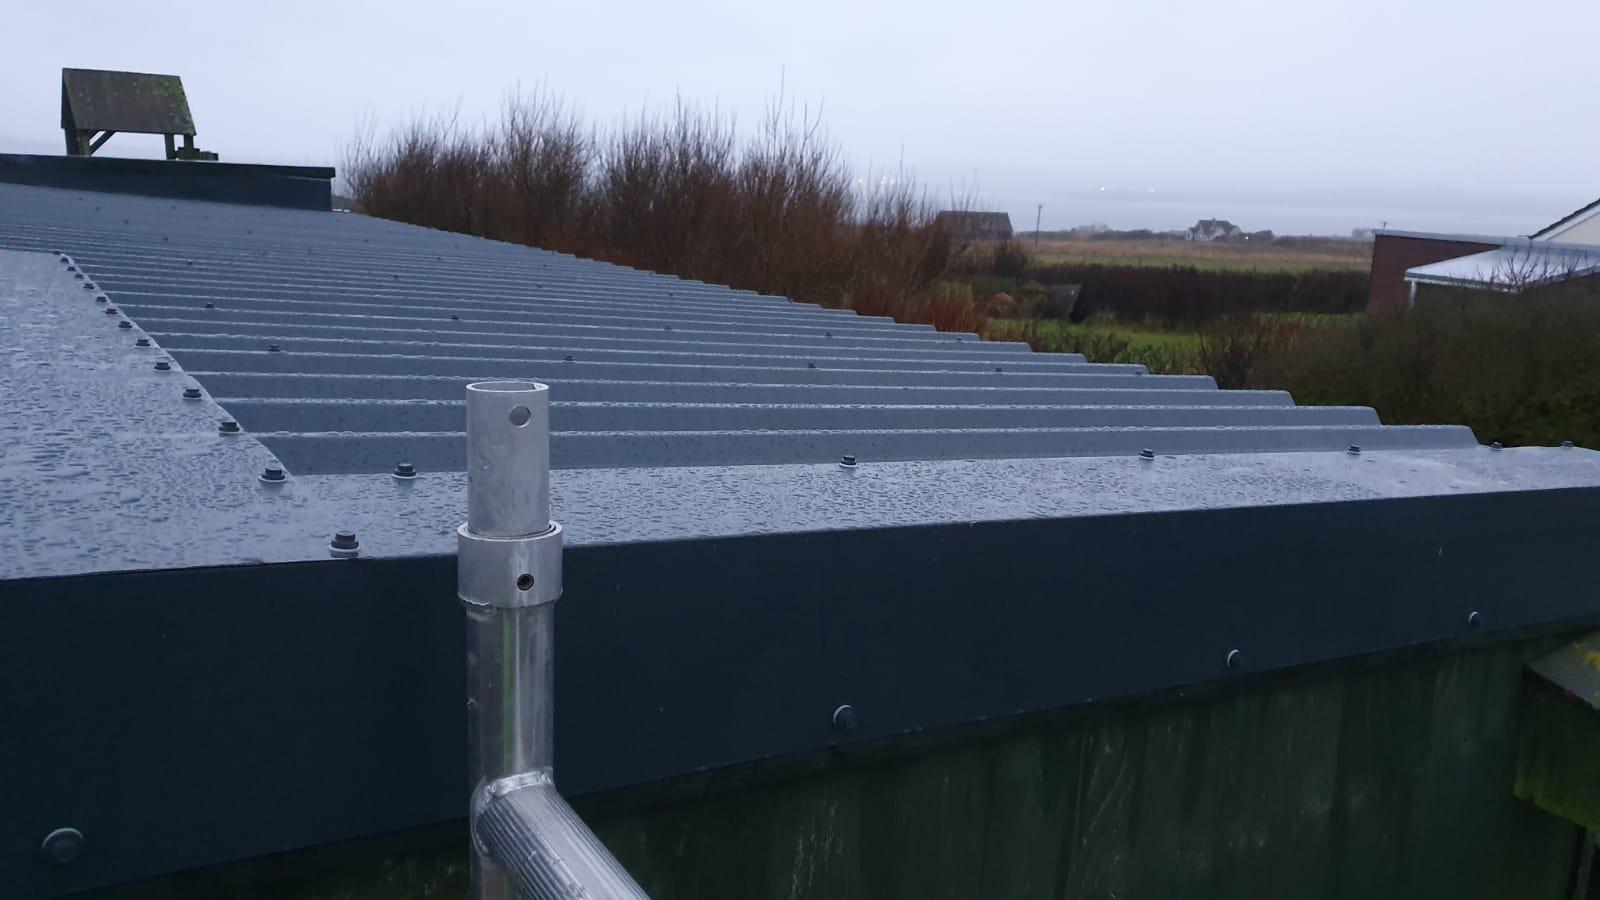 New Box profile Roof